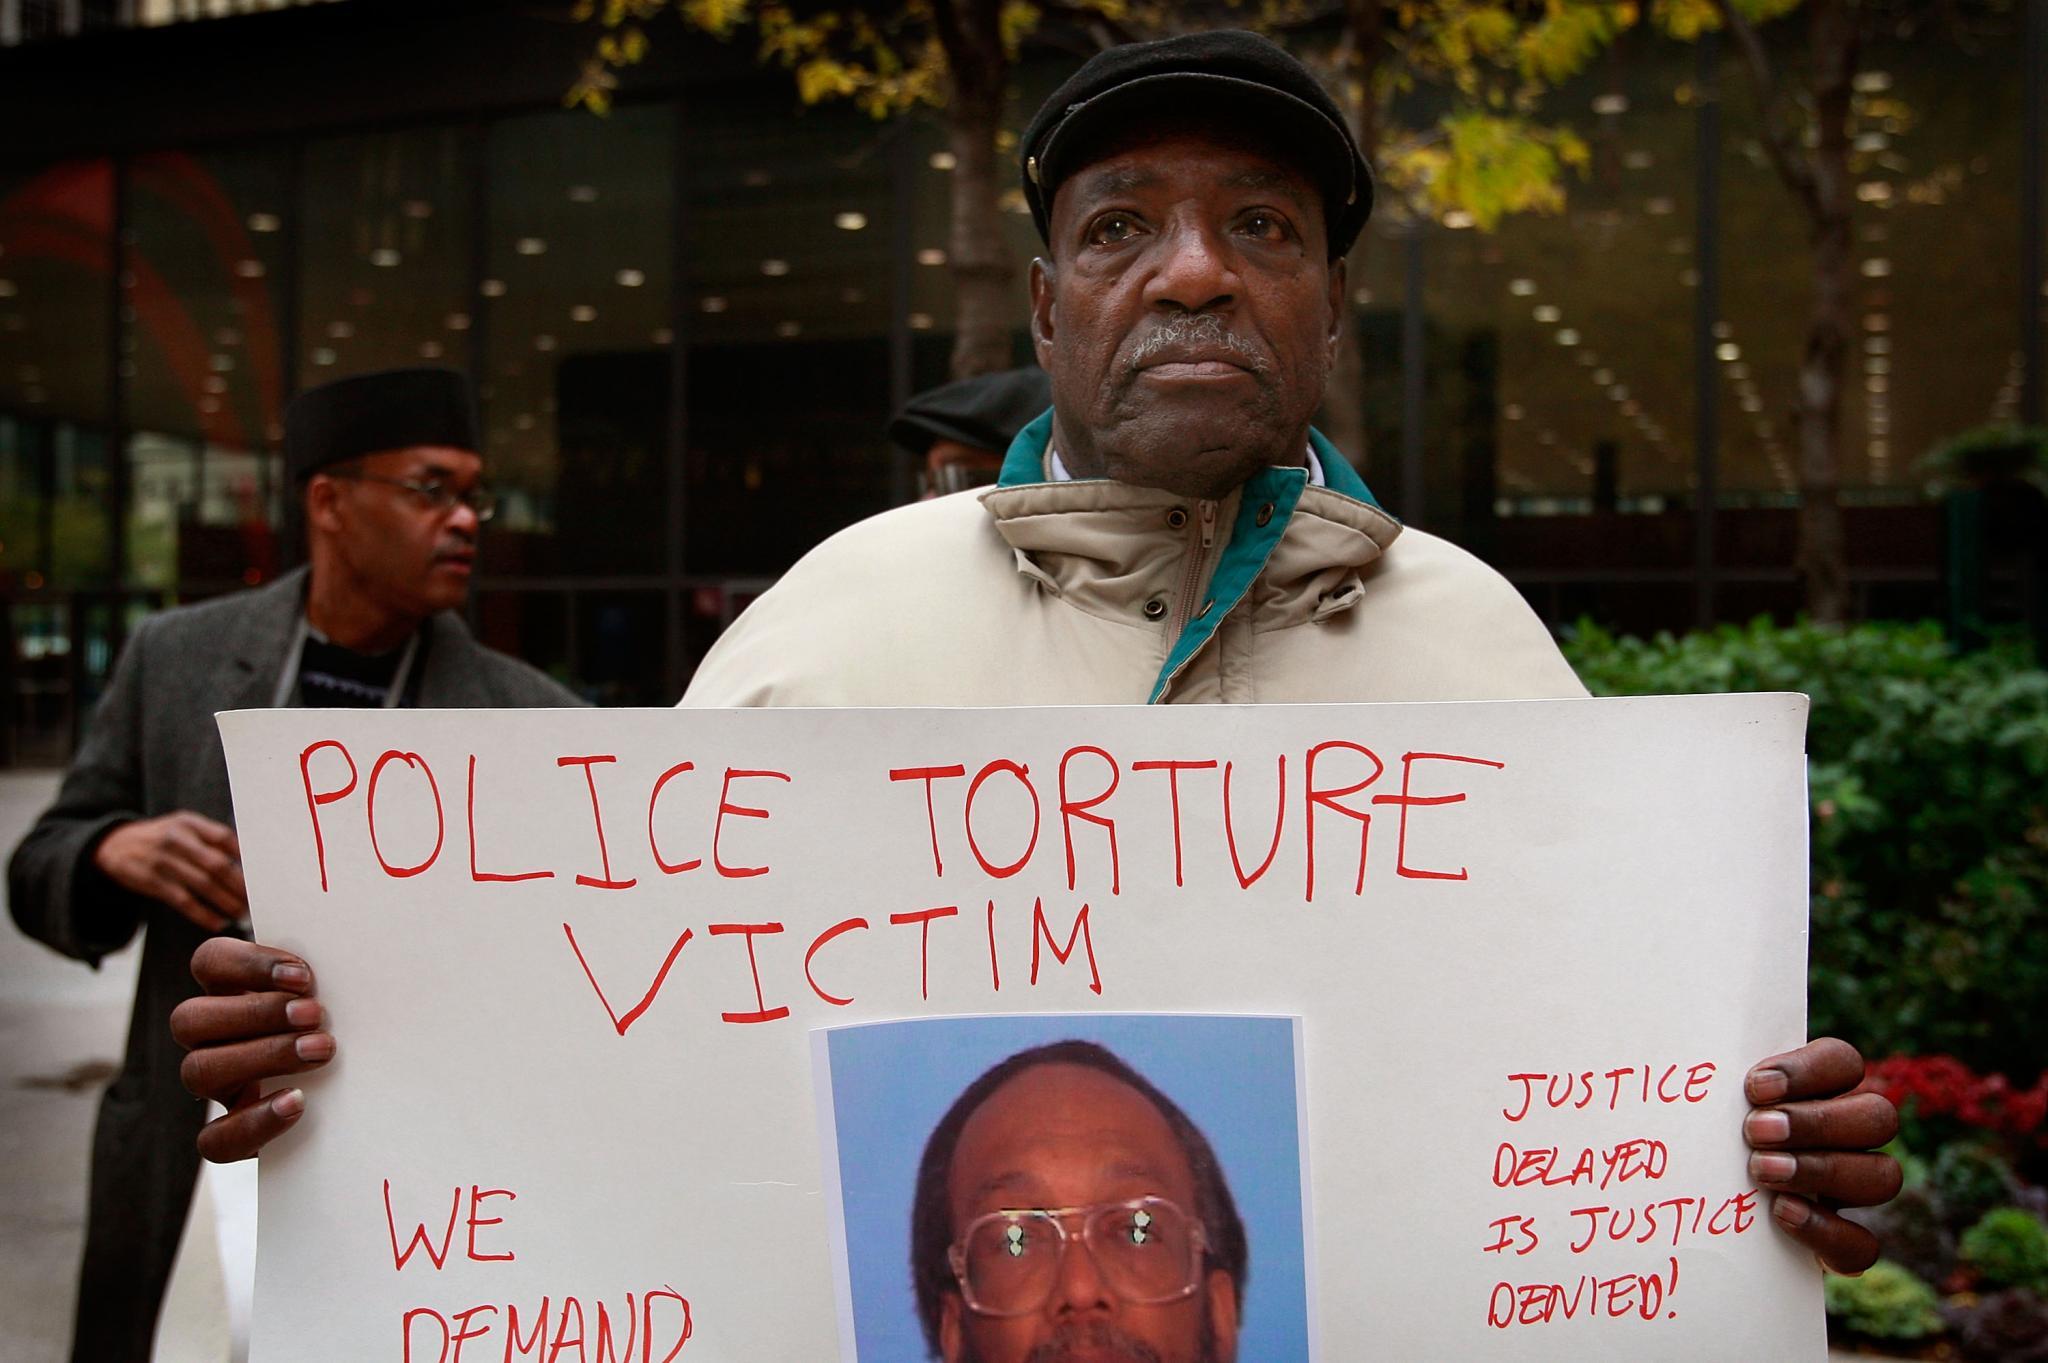 Jon Burge, Former Chicago Police Cmdr. Responsible for Torture of Over 100 Black Men, Dead at 70